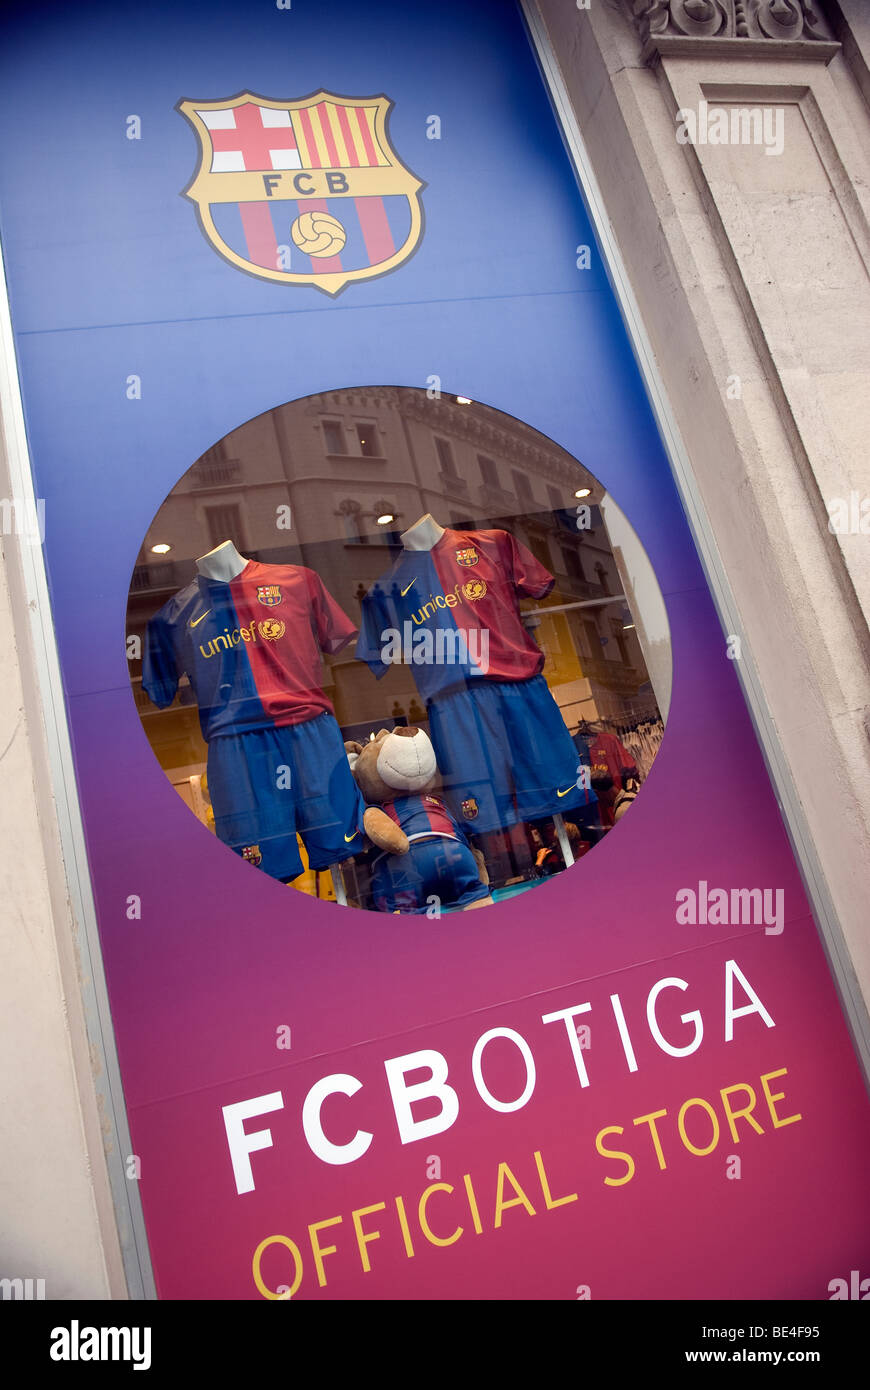 Barcelona Football Club store - Stock Image